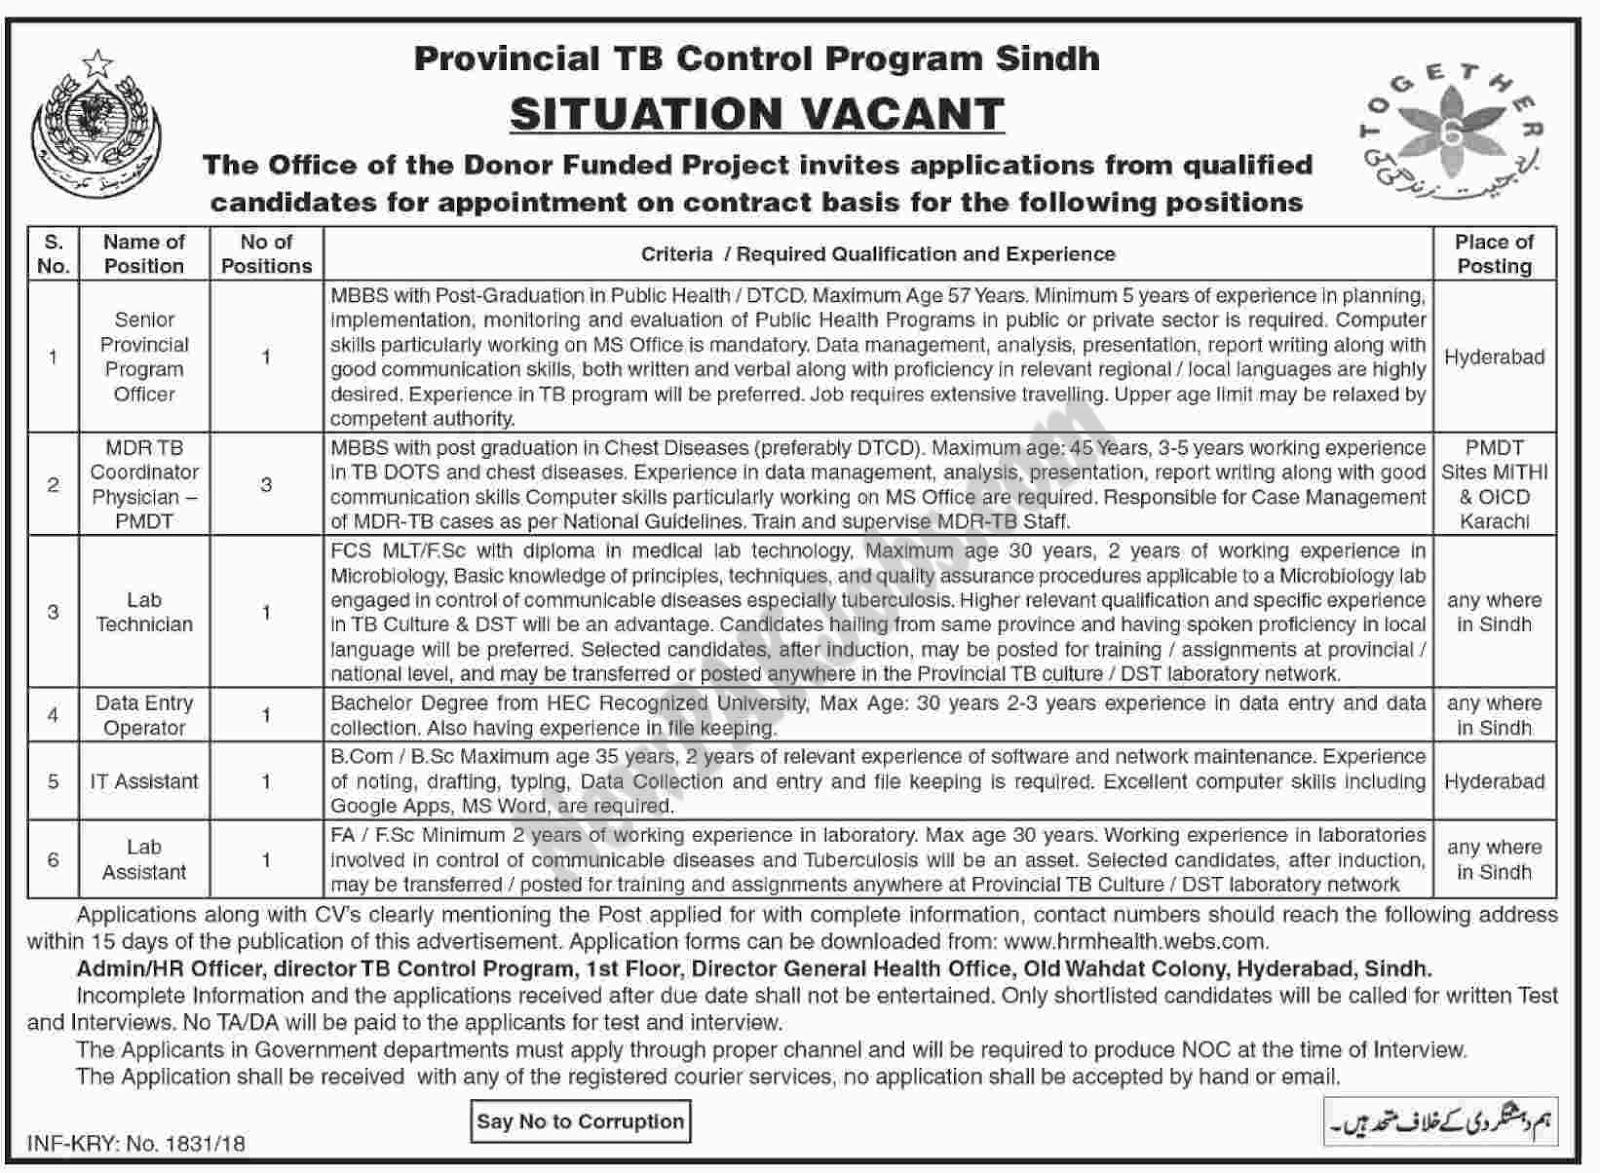 Provincial TB Control Program Sindh